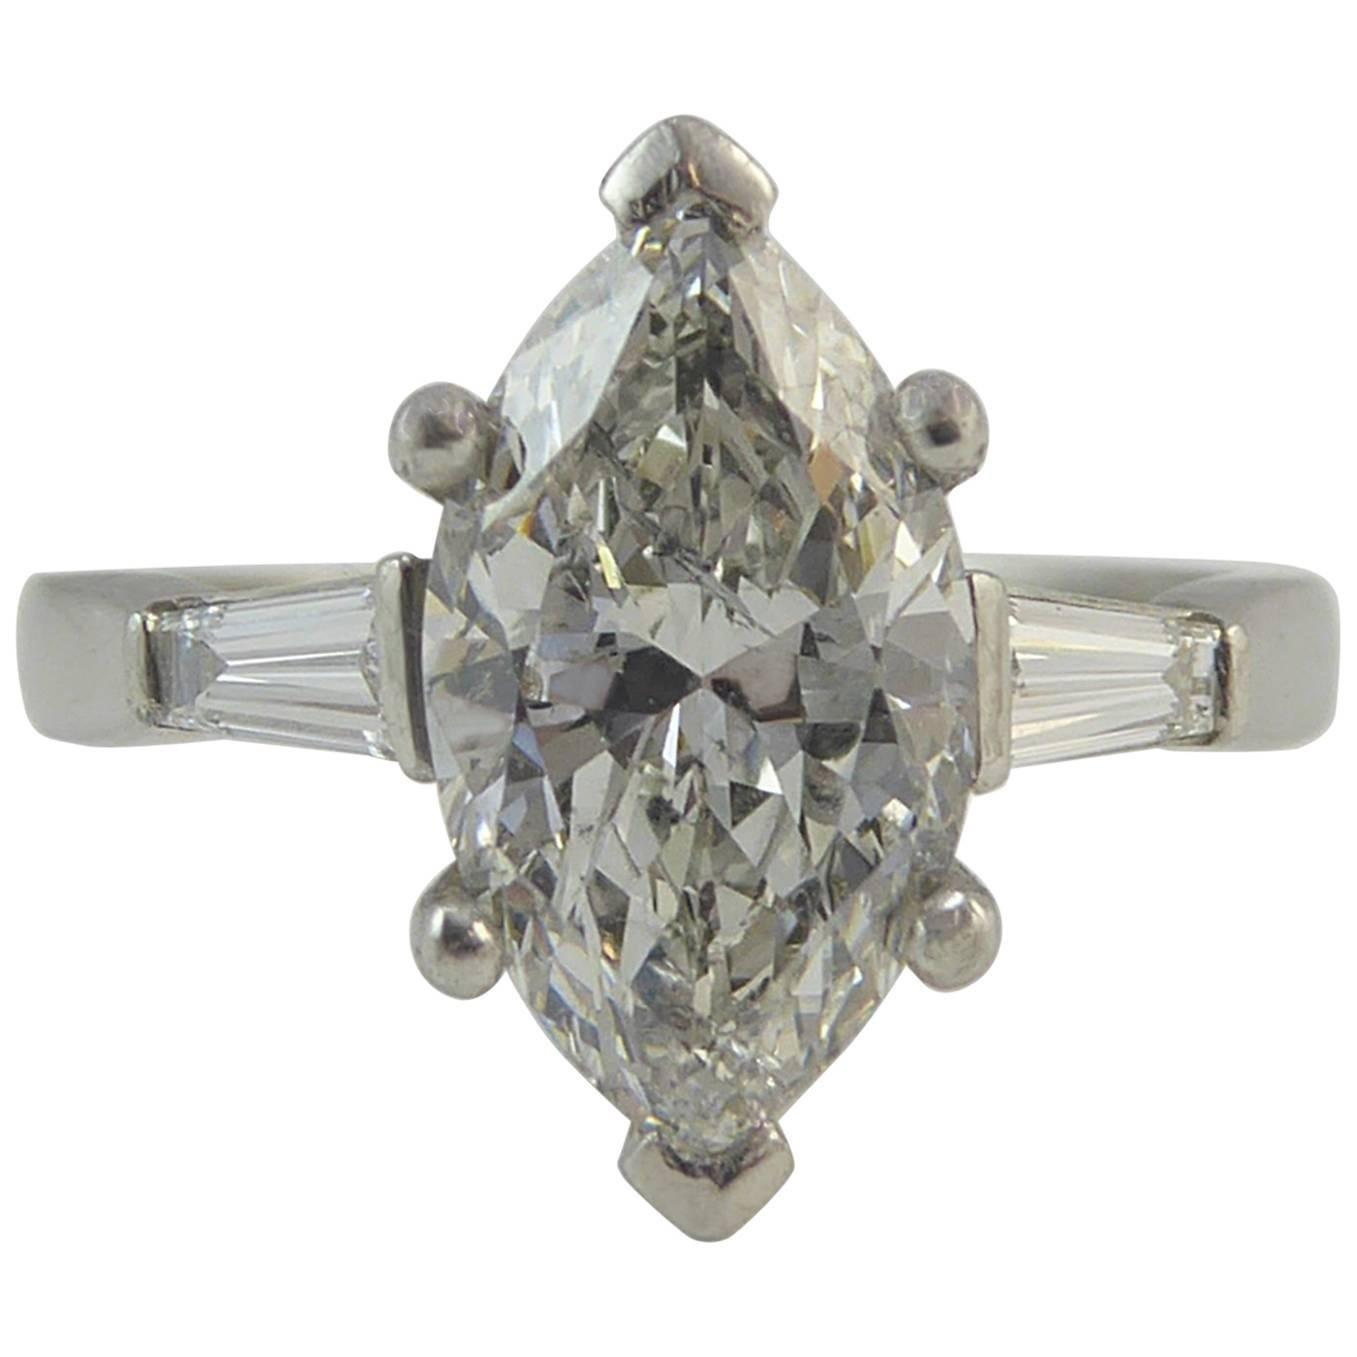 1.73 Carat Marquise Diamond Ring, Tapered Baguette Diamond Set Shoulders